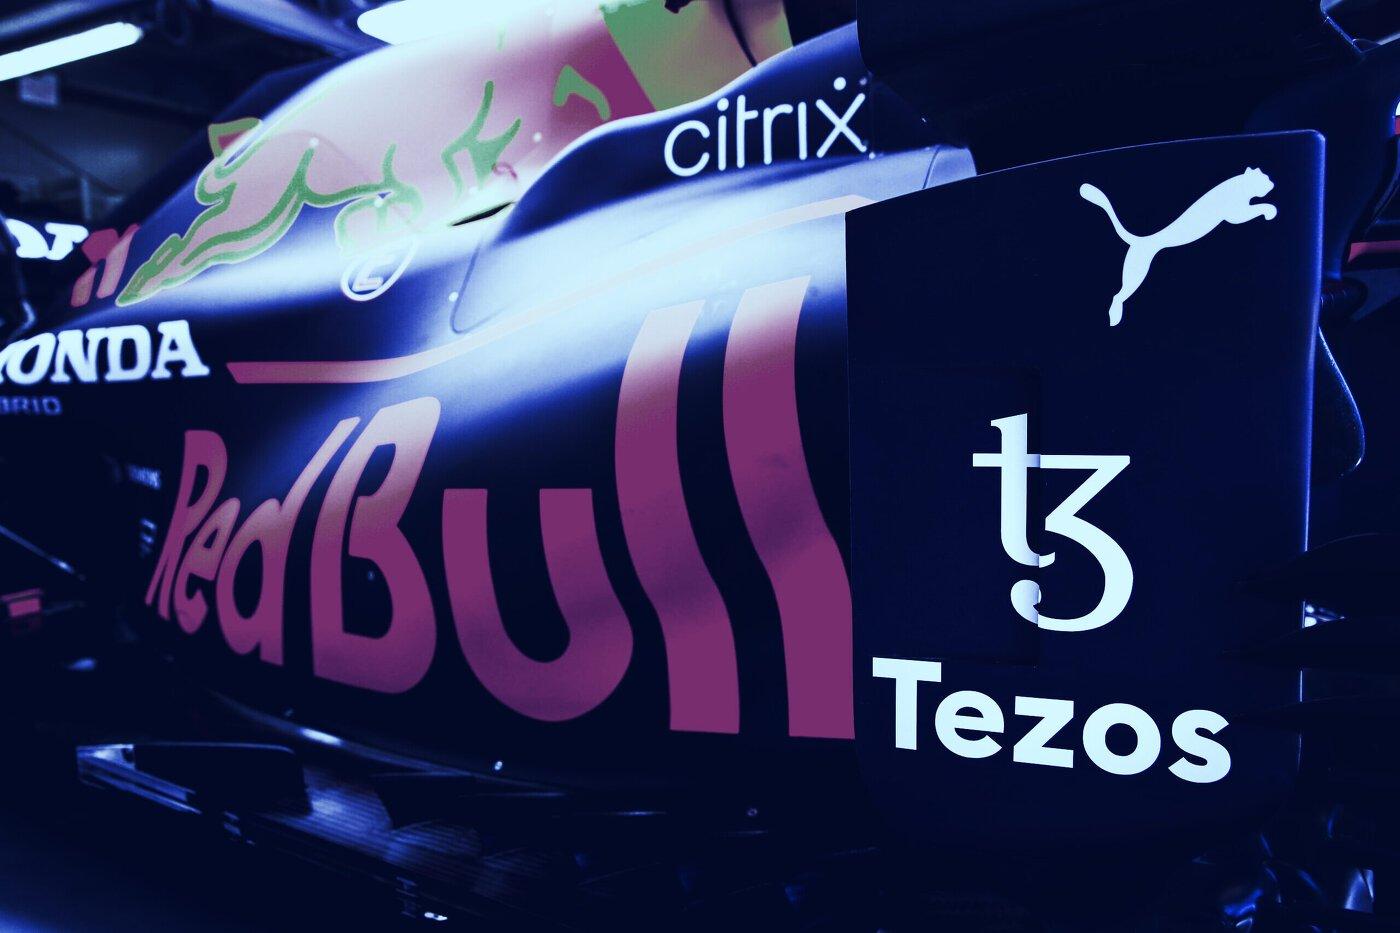 Red Bull Racing Tezos